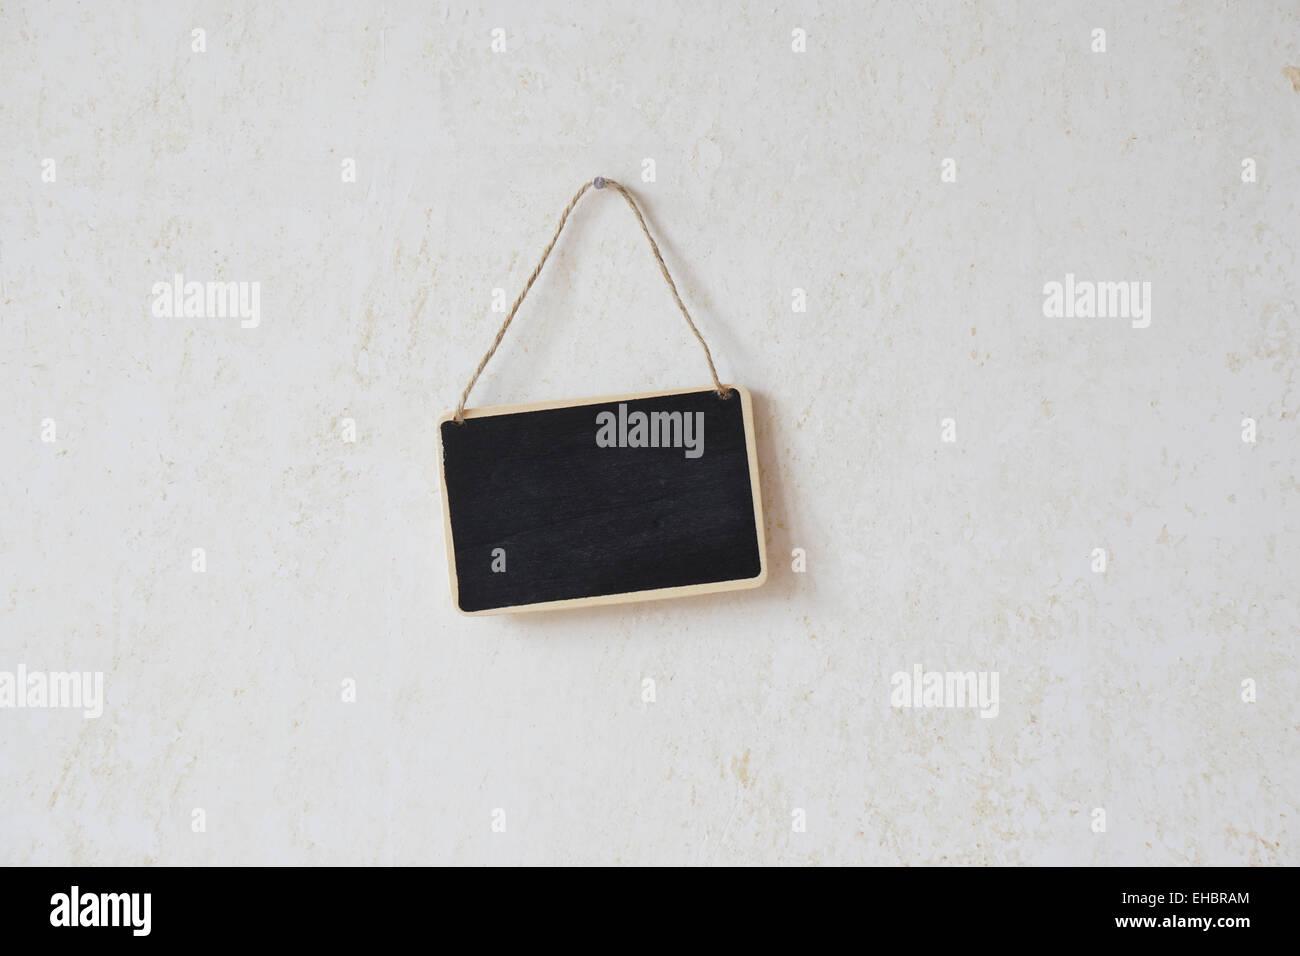 blank chalkboard sign - Stock Image